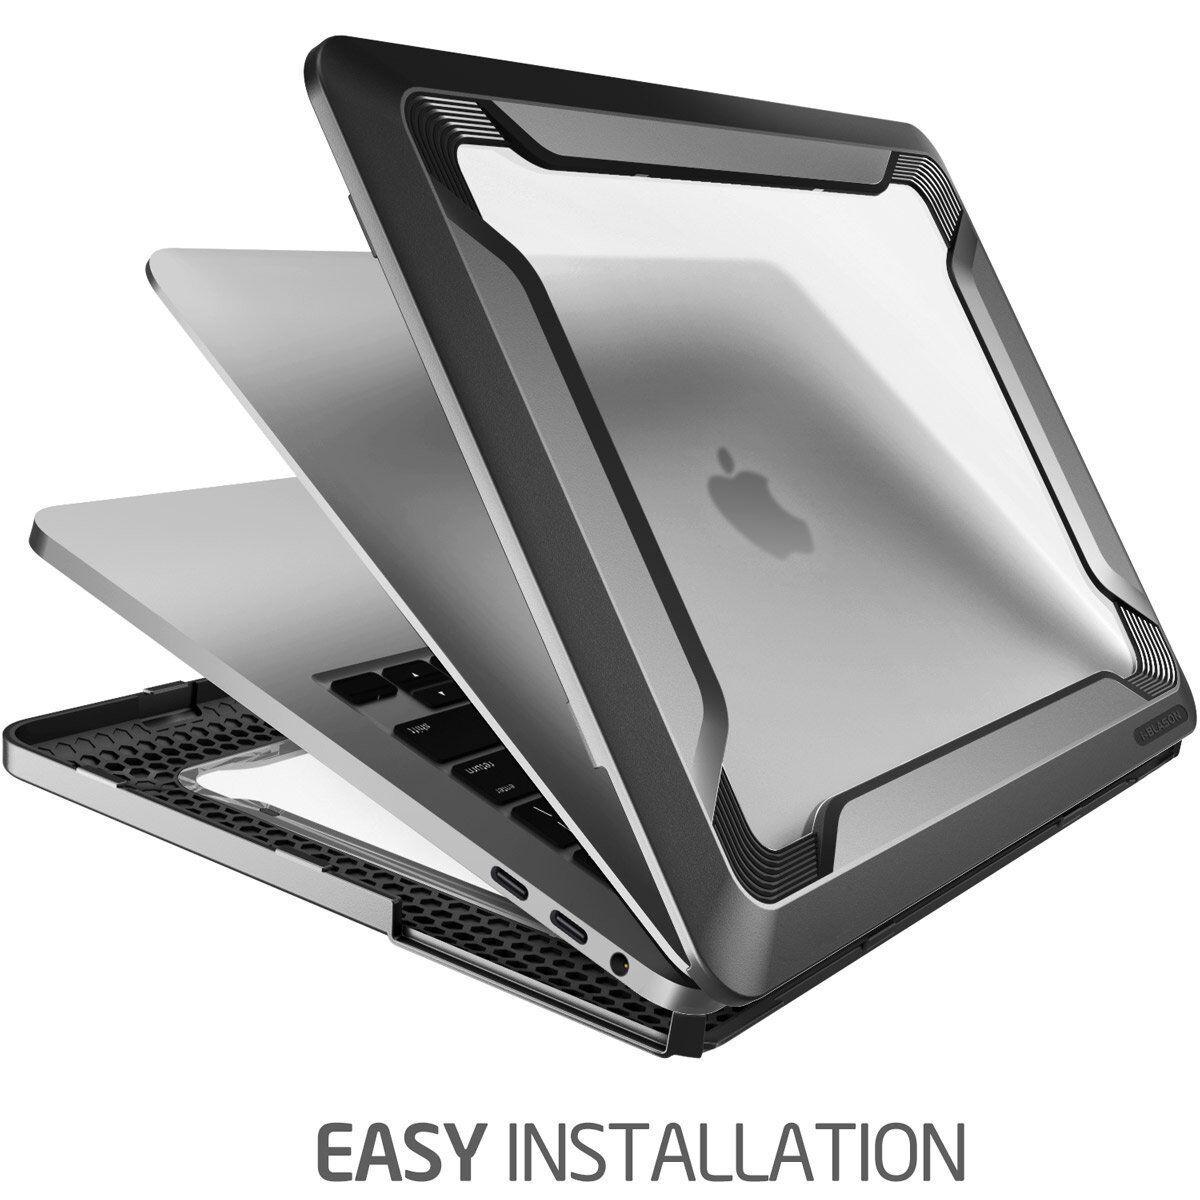 как выглядит Сумка или чехол для ноутбука i-Blason Macbook Pro 15 Slim Rubberized [Dual Layer] Cover with TPU Bumper фото